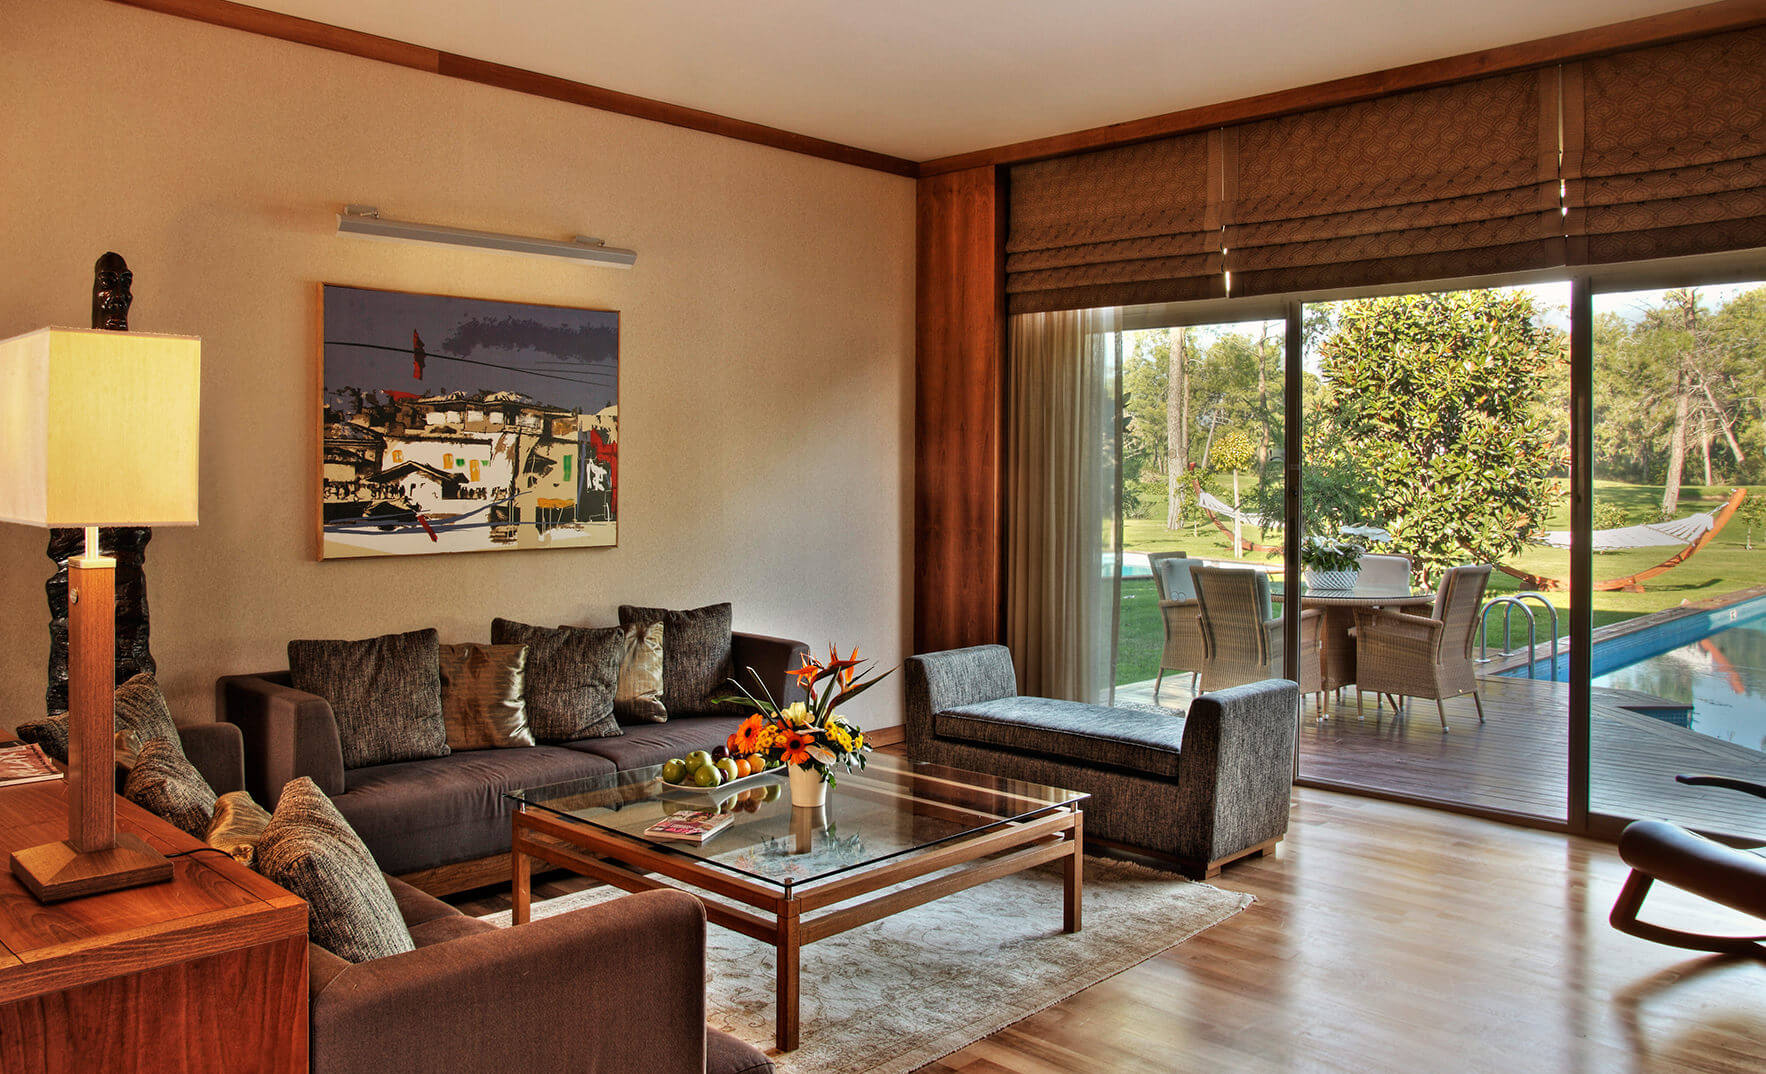 decoration villa de luxe awesome decoration villa de luxe maison design sibfa com with. Black Bedroom Furniture Sets. Home Design Ideas